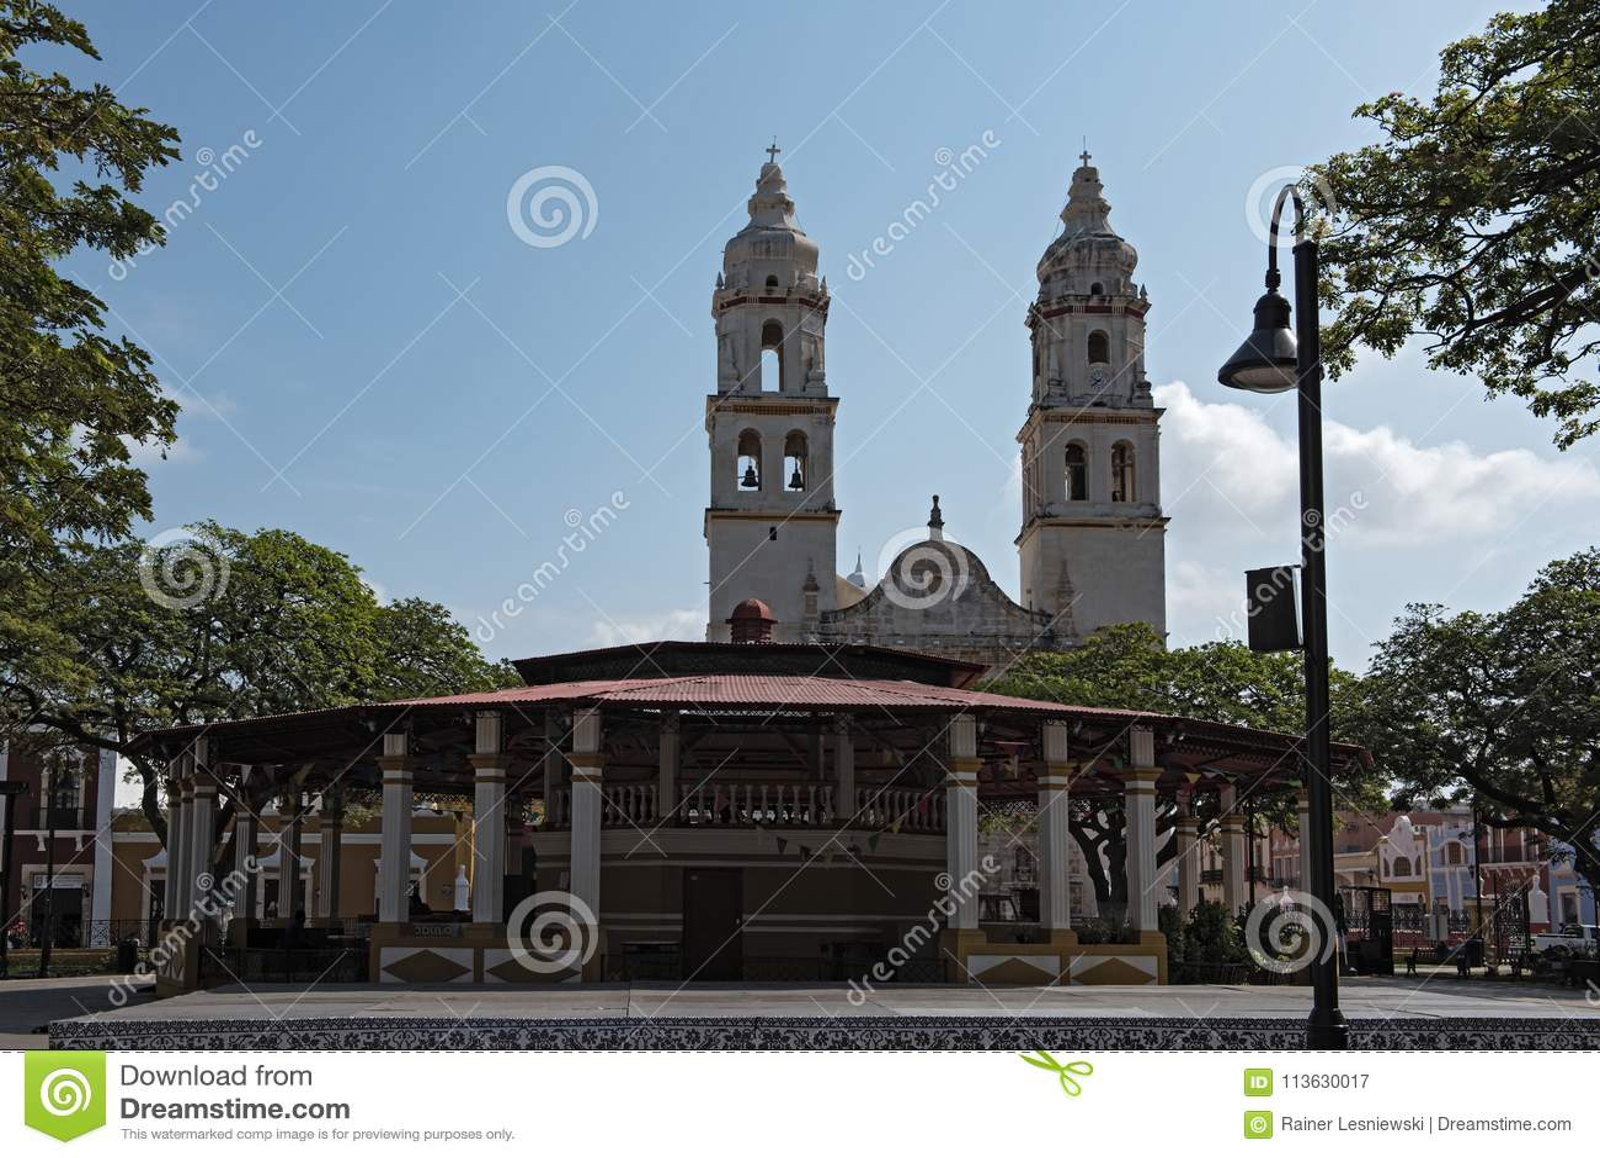 Campeche, Mexico   San Francisco de Campeche is the ...   Campeche City Monuments